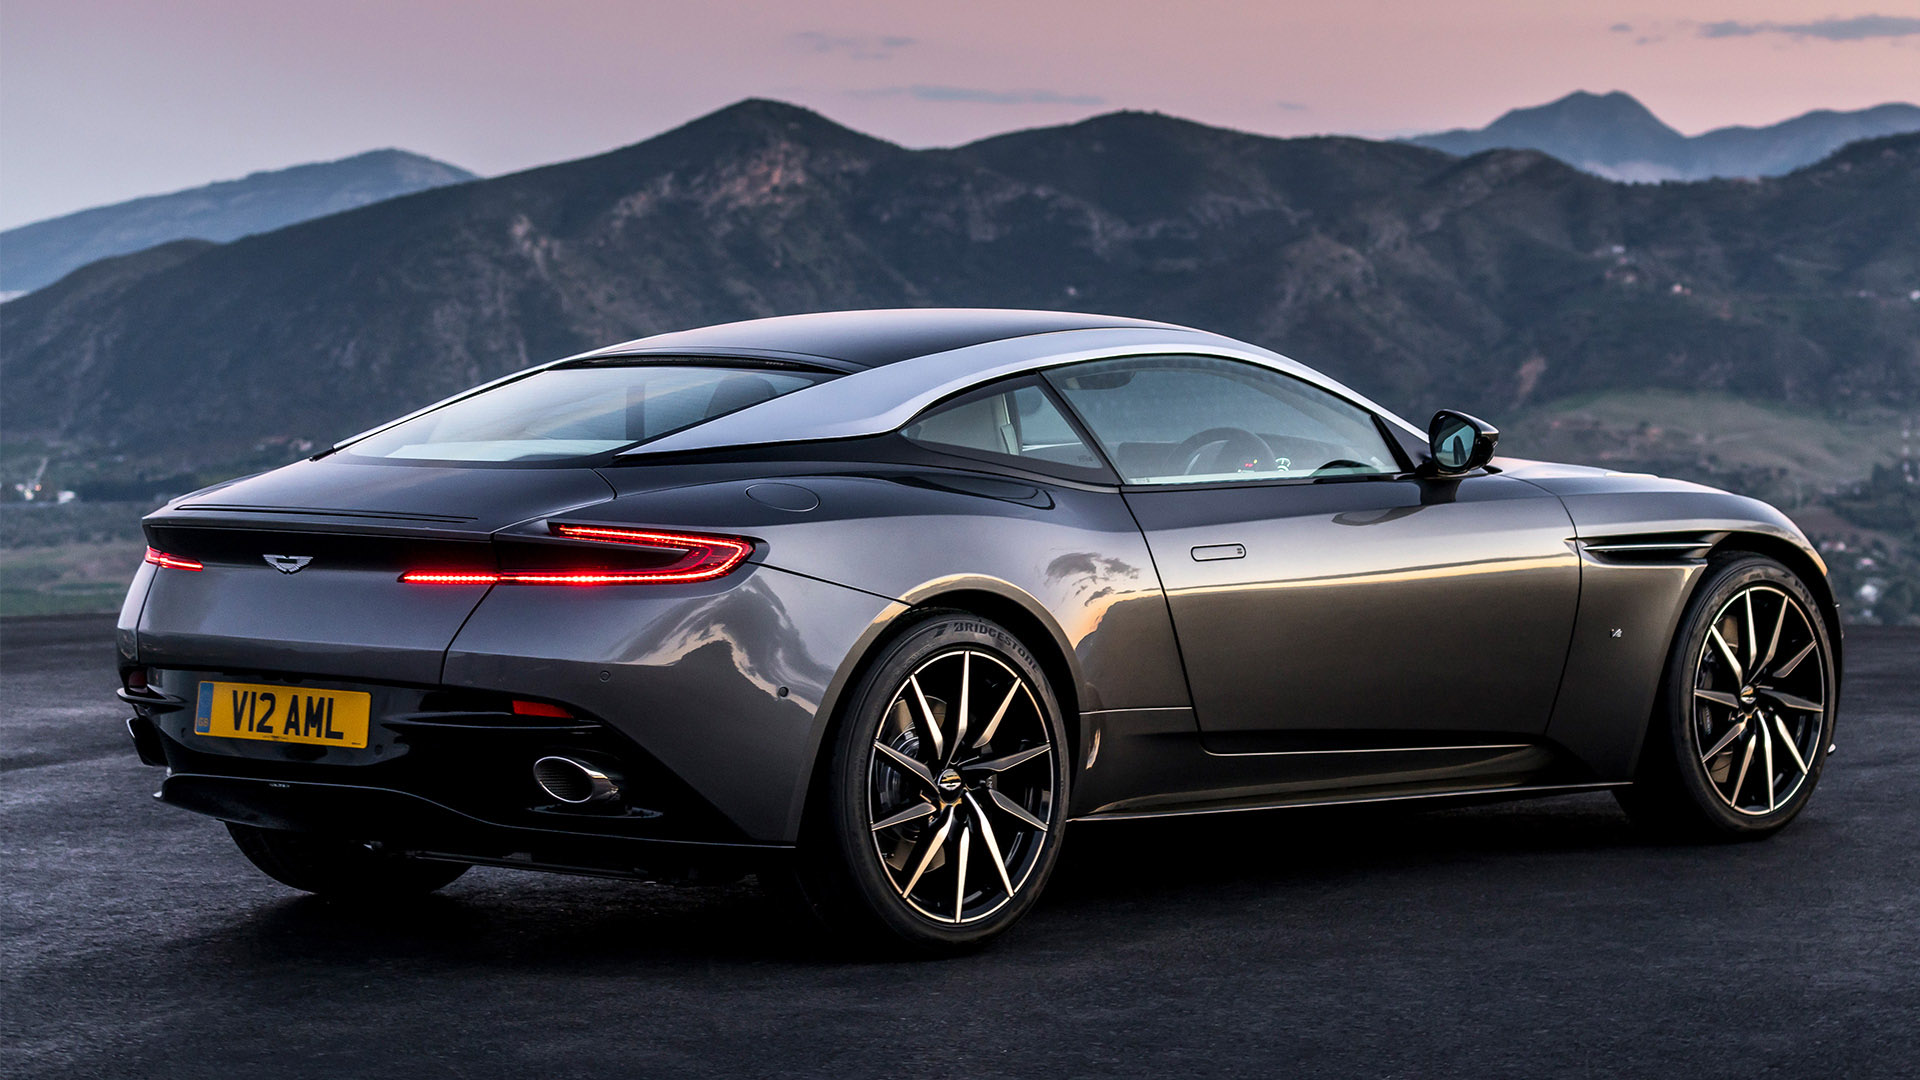 Investindustrial Aston Martin - What is an aston martin